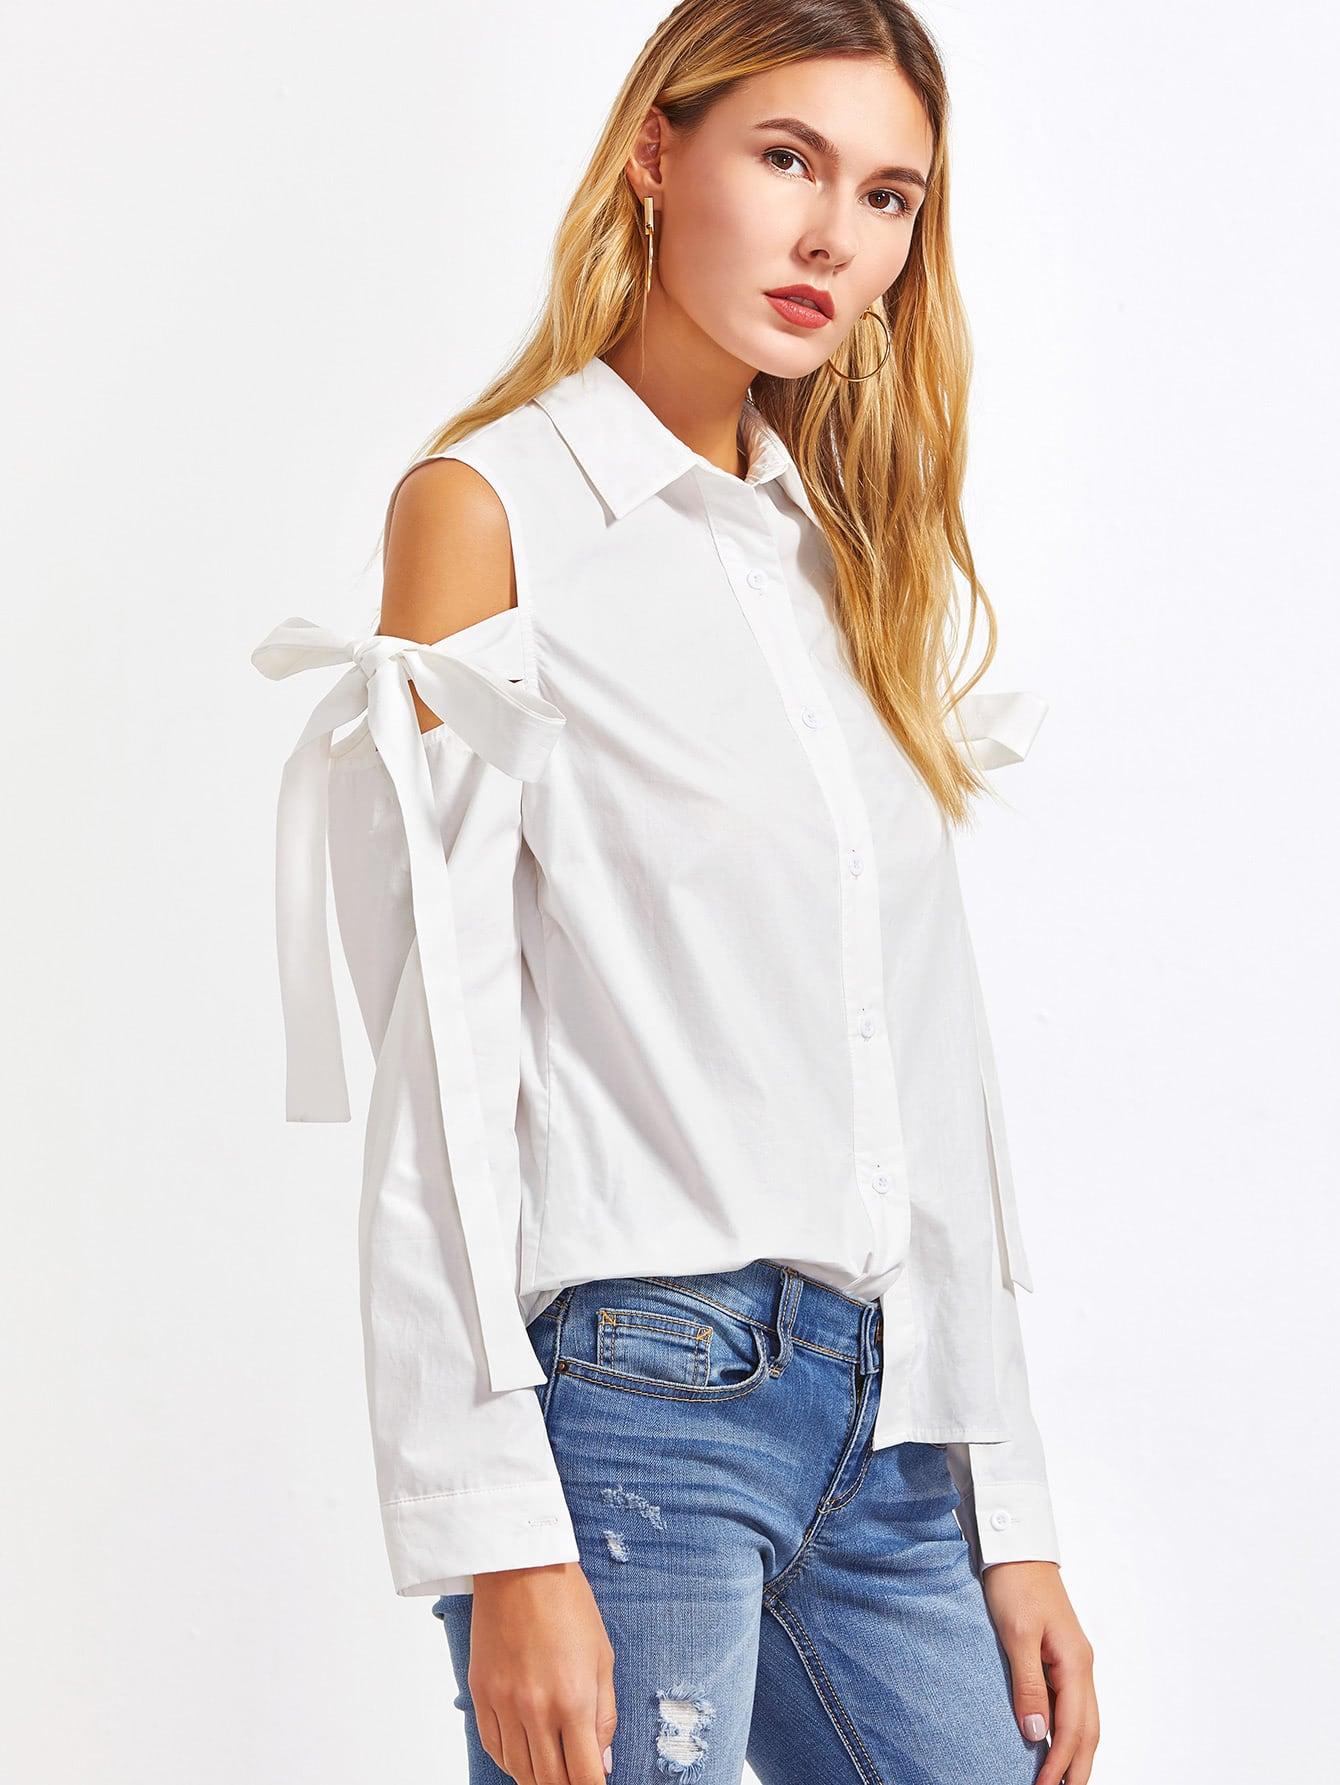 blouse161122704_2